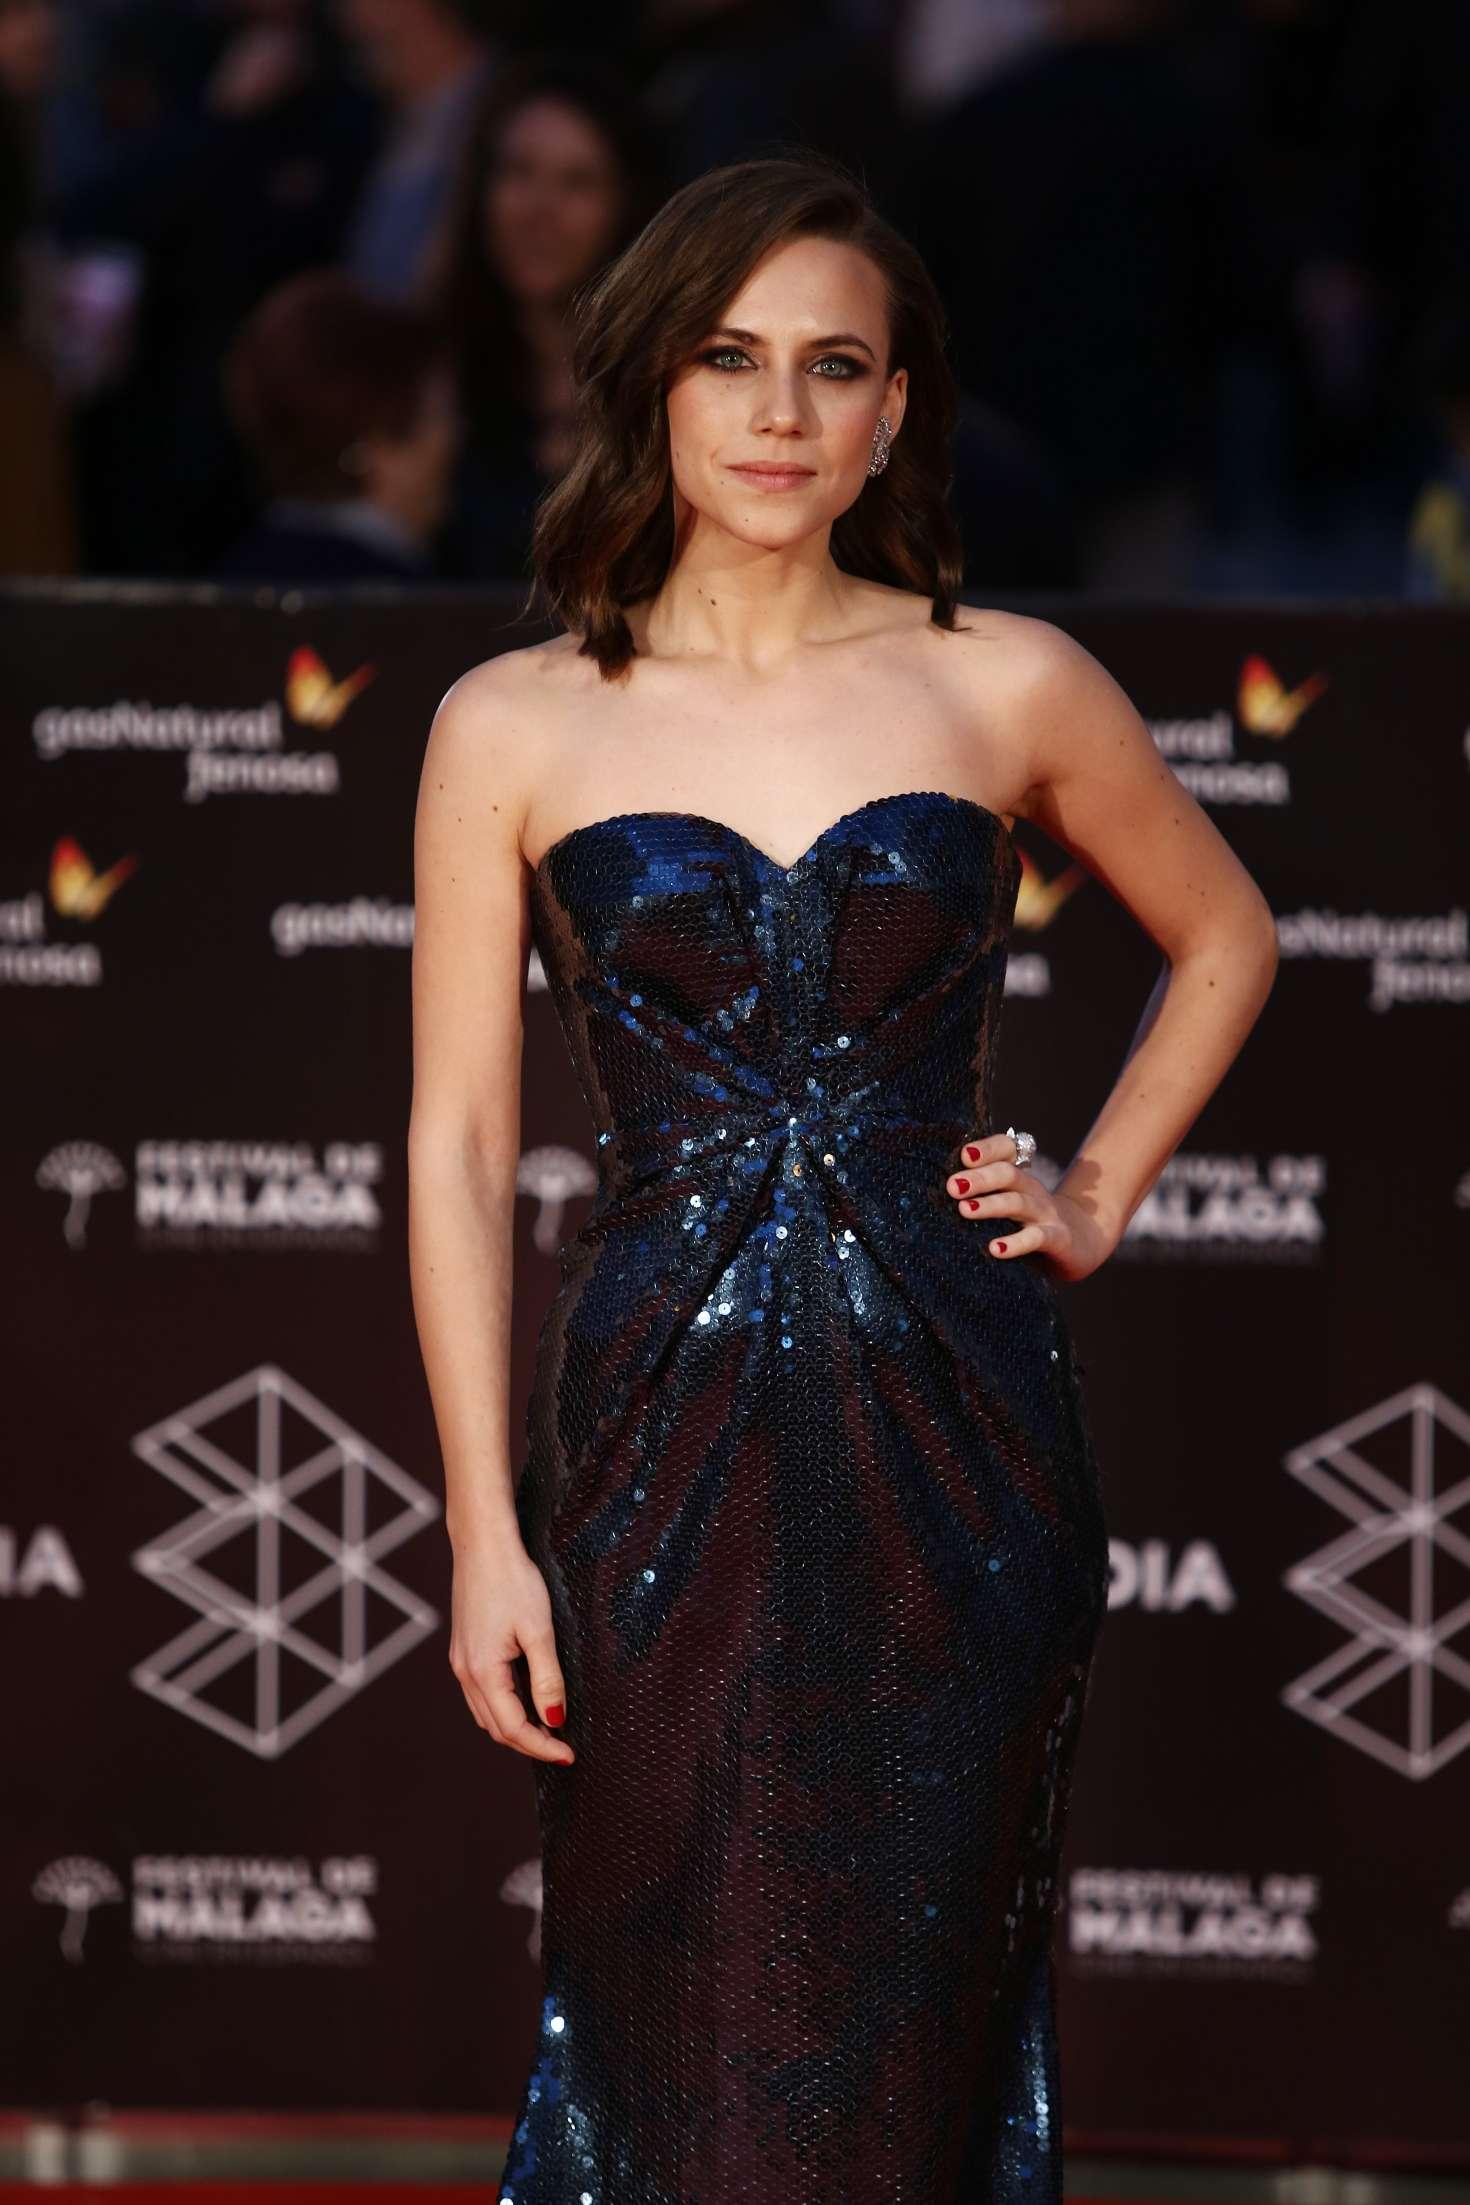 Aura Garrido - Malaga Sur Award Ceremony 2018